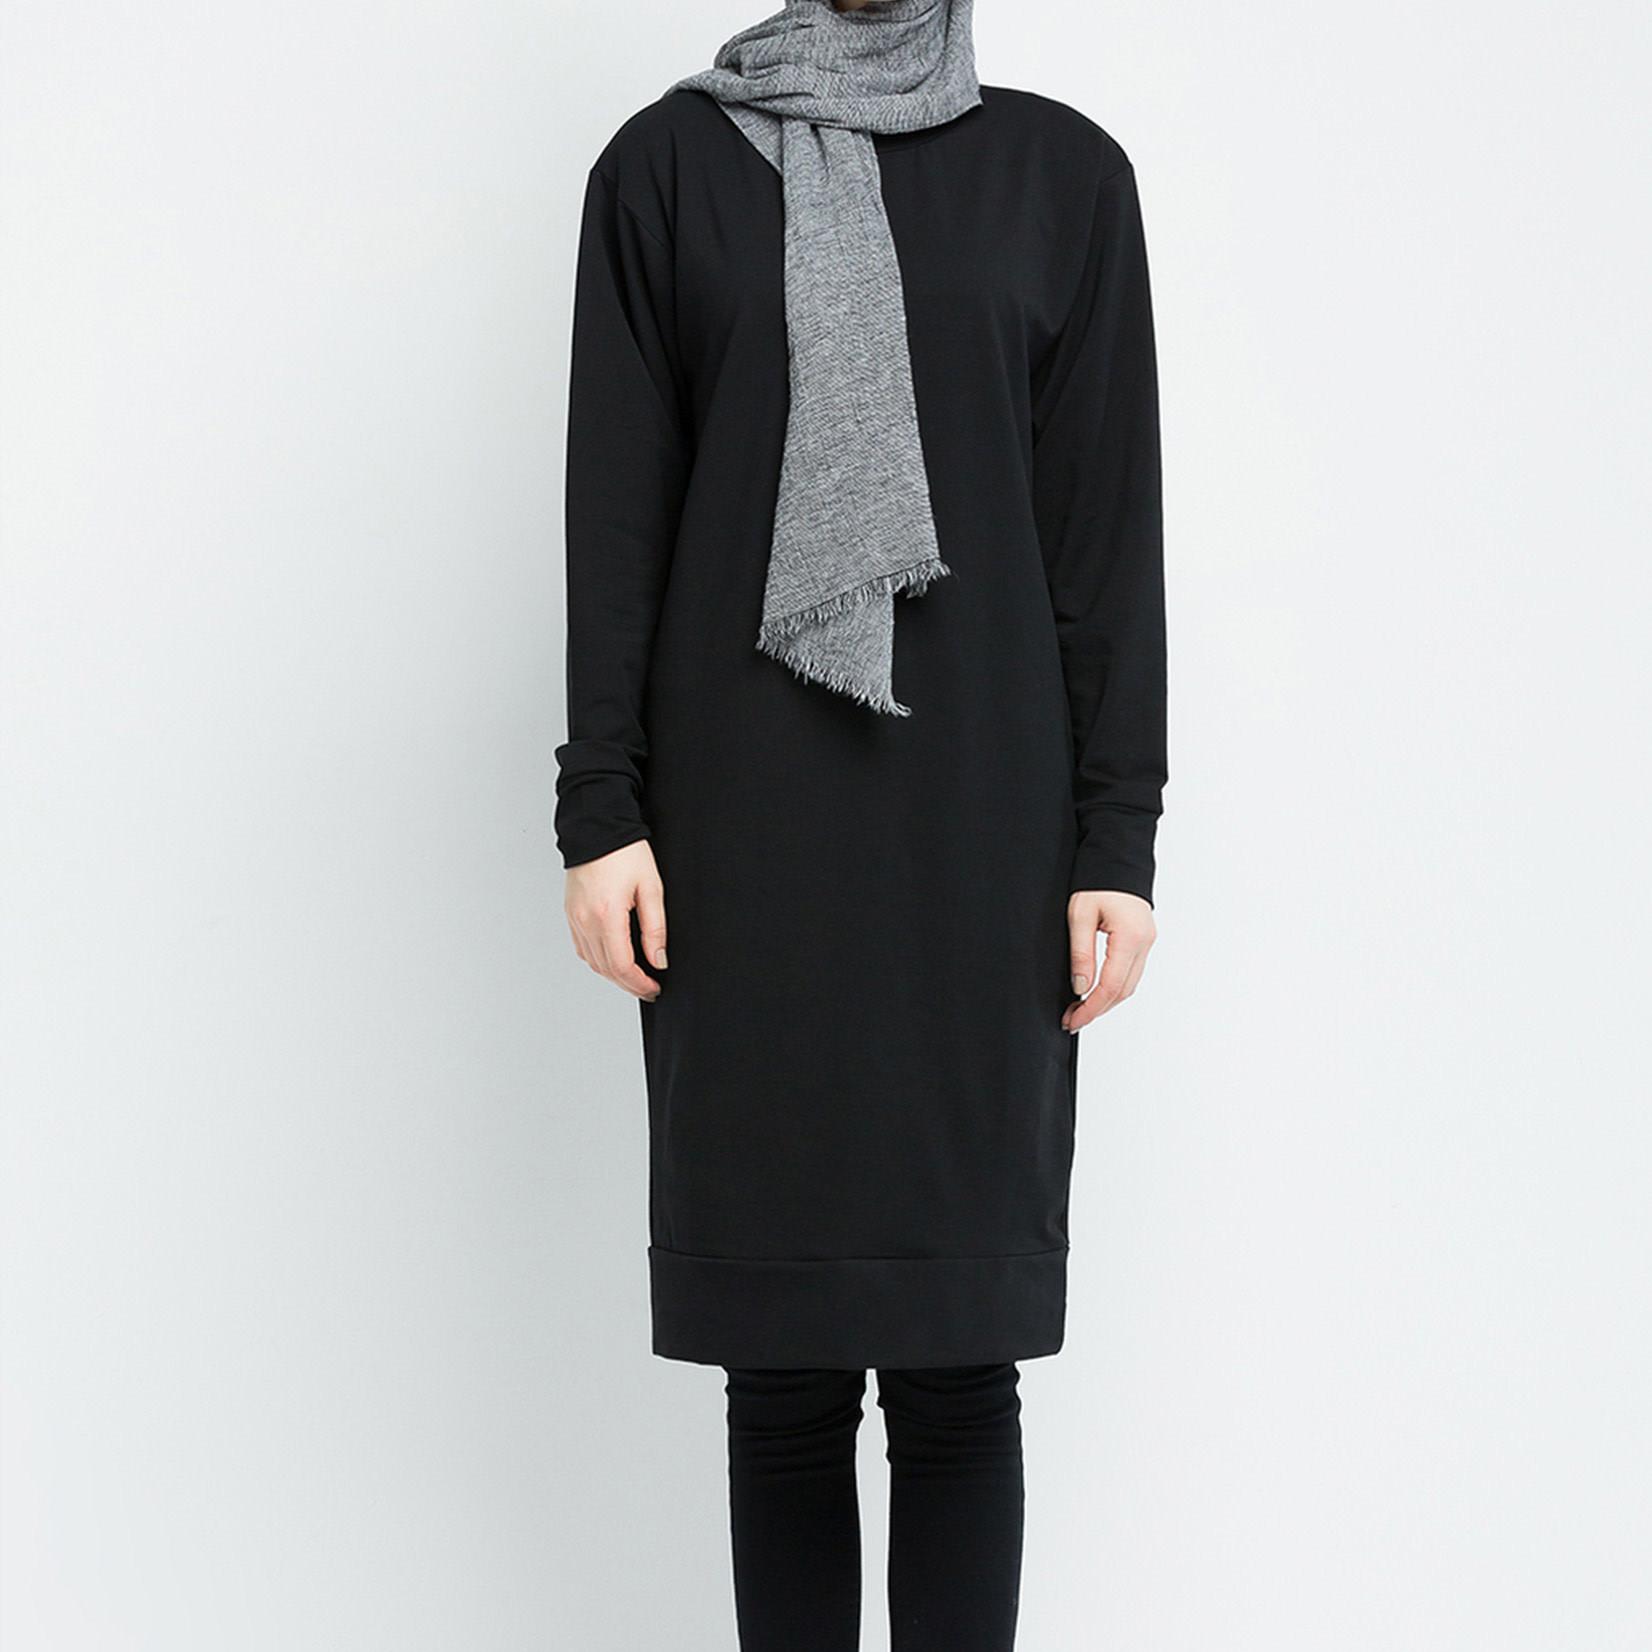 Hijab House Black Longline Knit